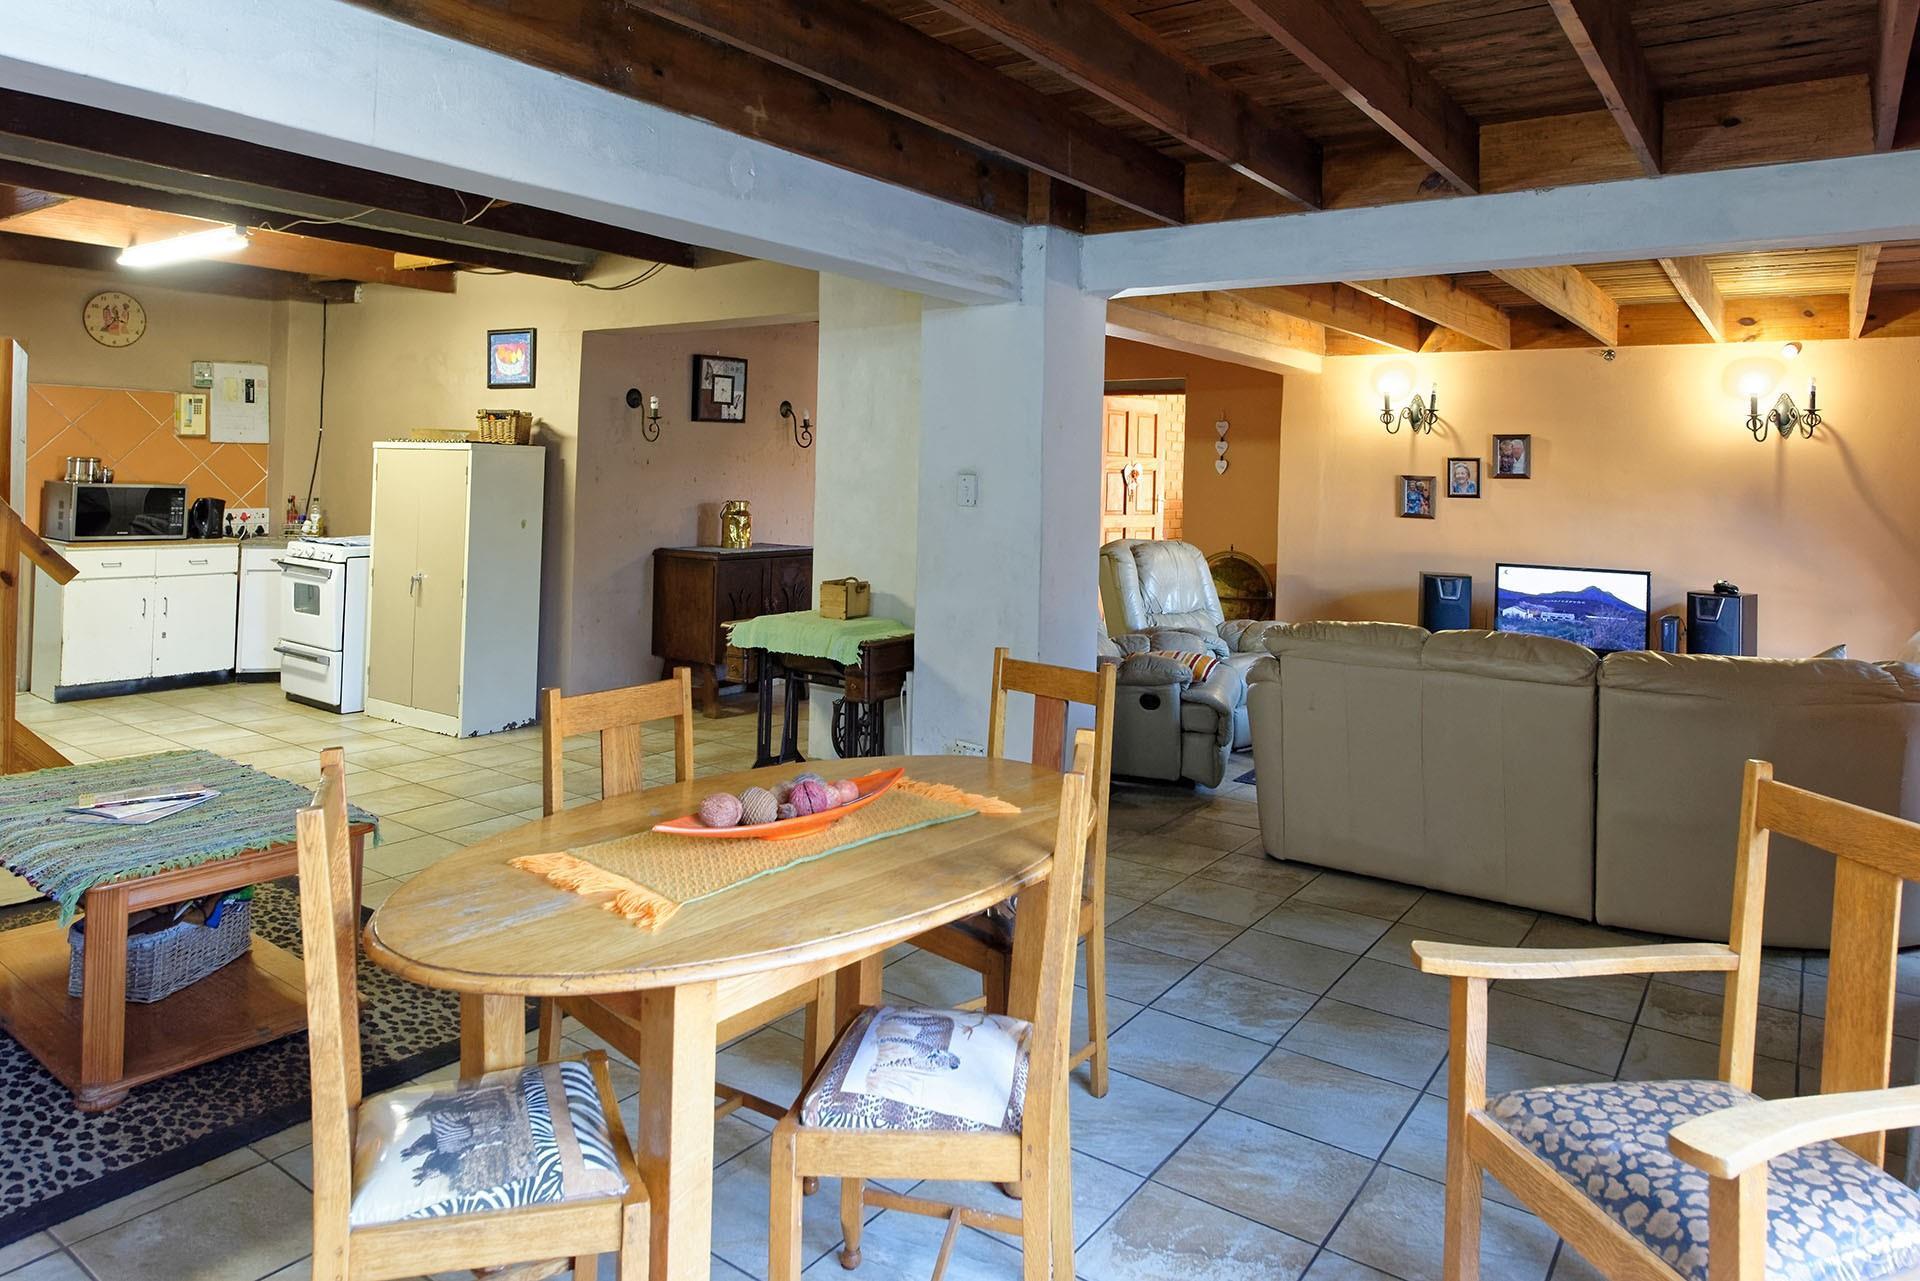 3 Bedroom House For Sale in Vanderbijlpark SE 4